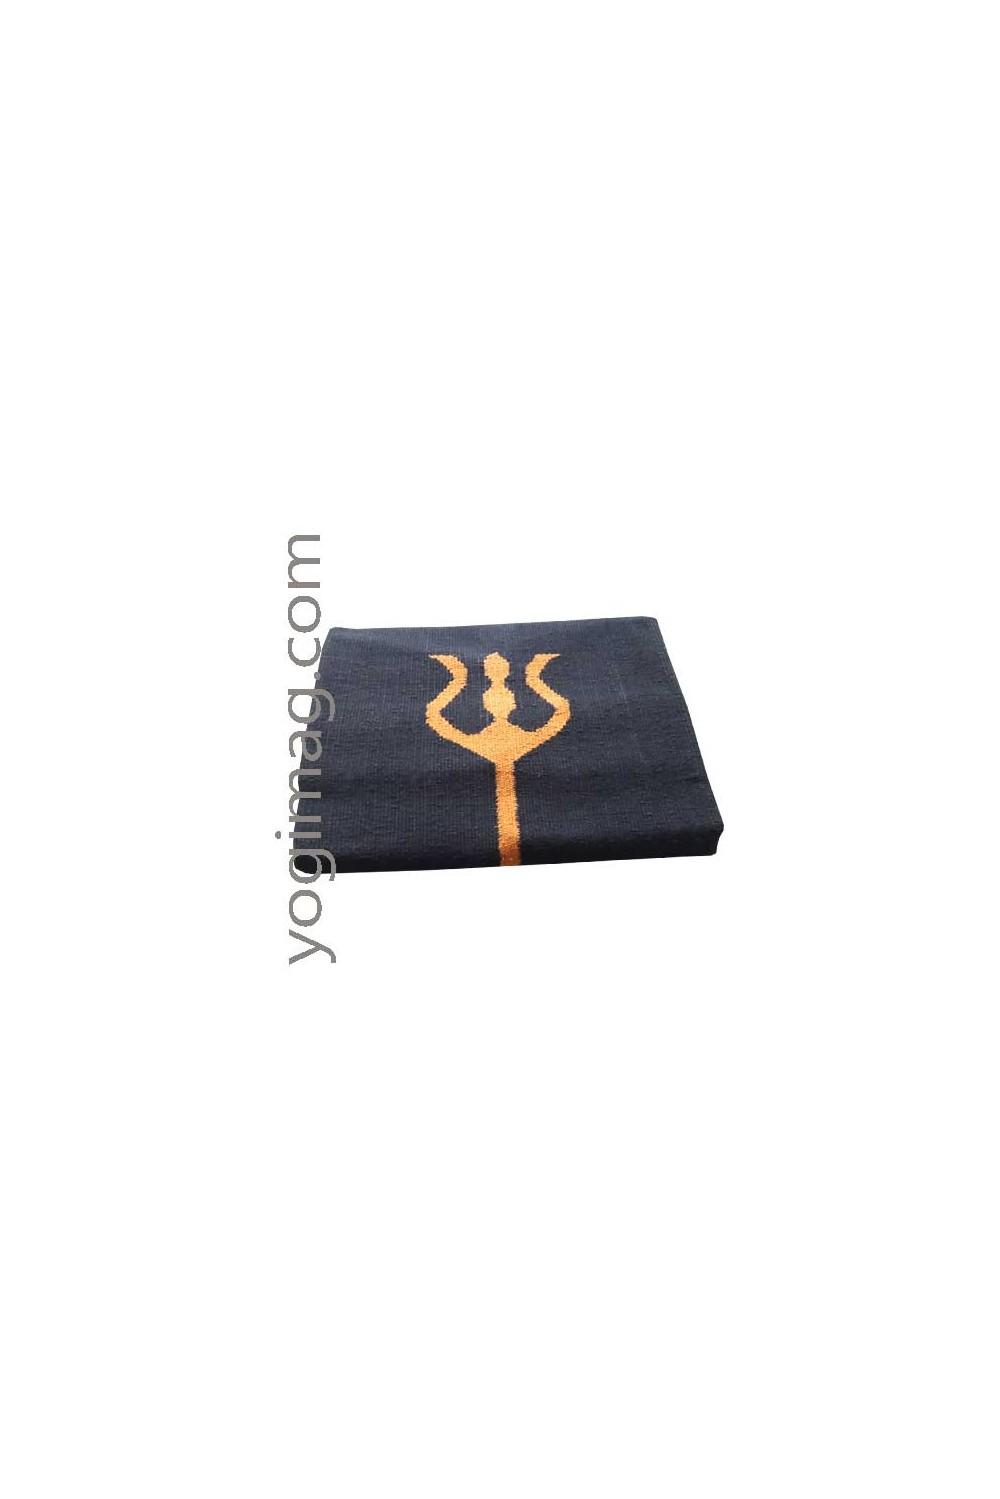 Tapis Yoga 100 Coton Naturel Et Son Trident